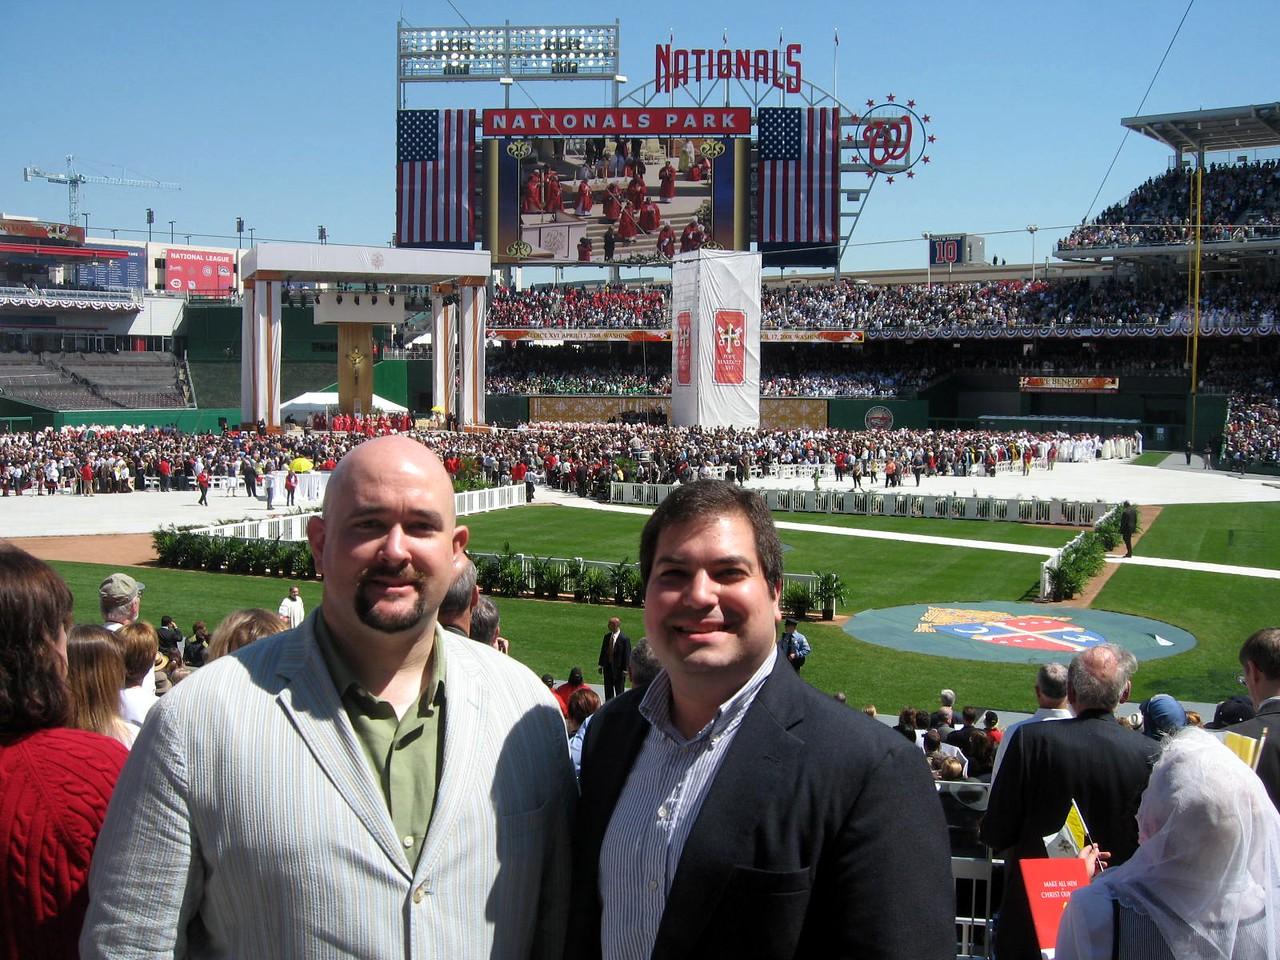 Leyton and Craig after the Mass